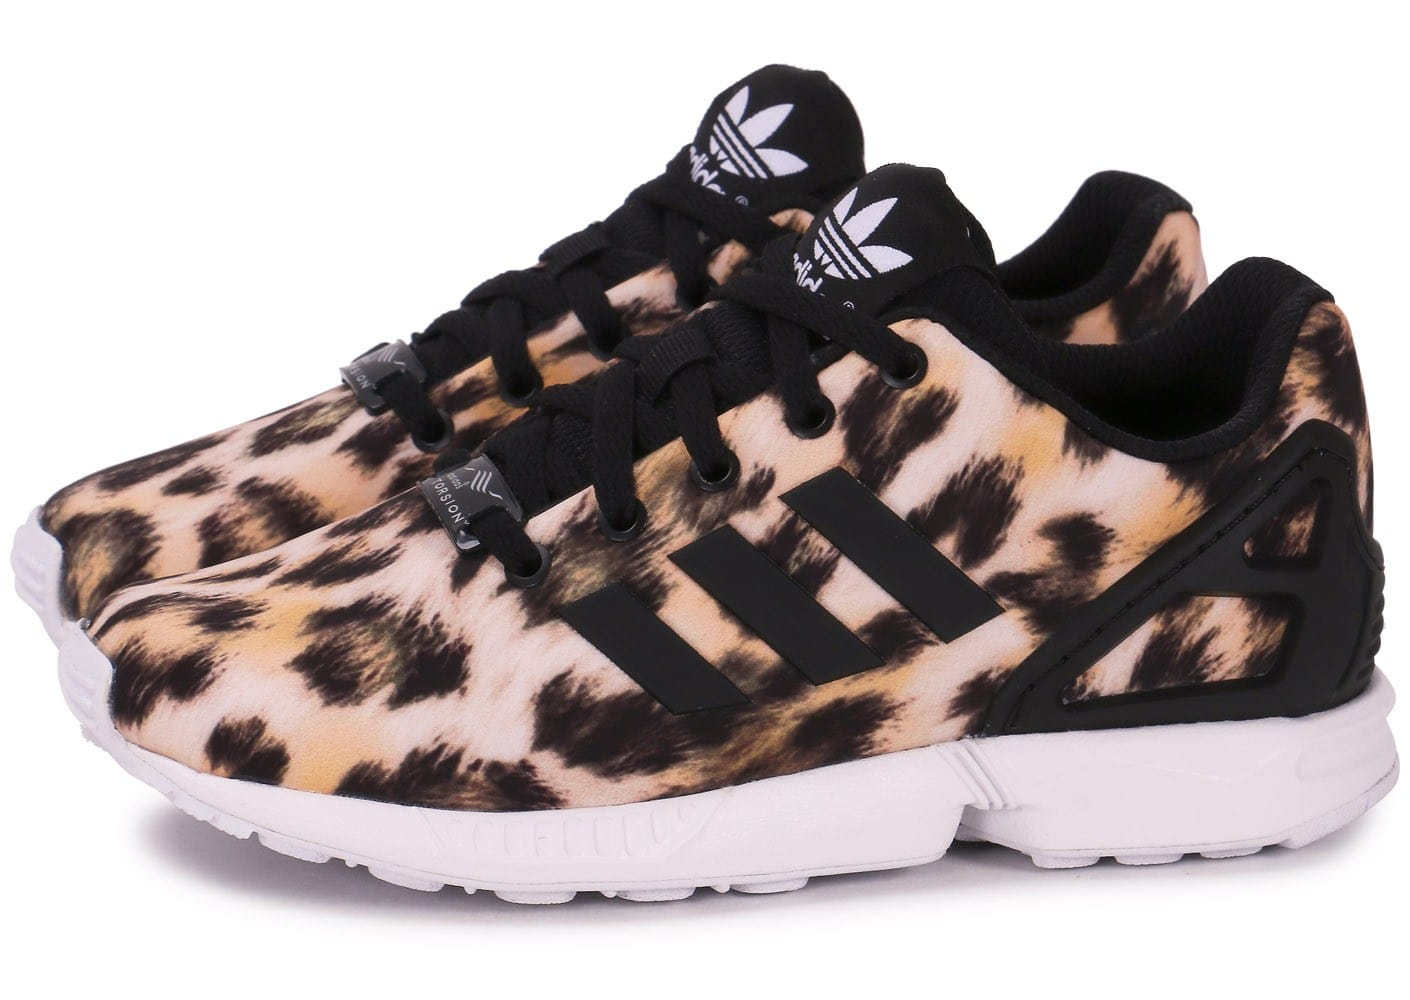 Adidas Leopard Leopard Adidas Chaussure Leopard Chaussure Chaussure Chaussure Adidas WYEH2D9I